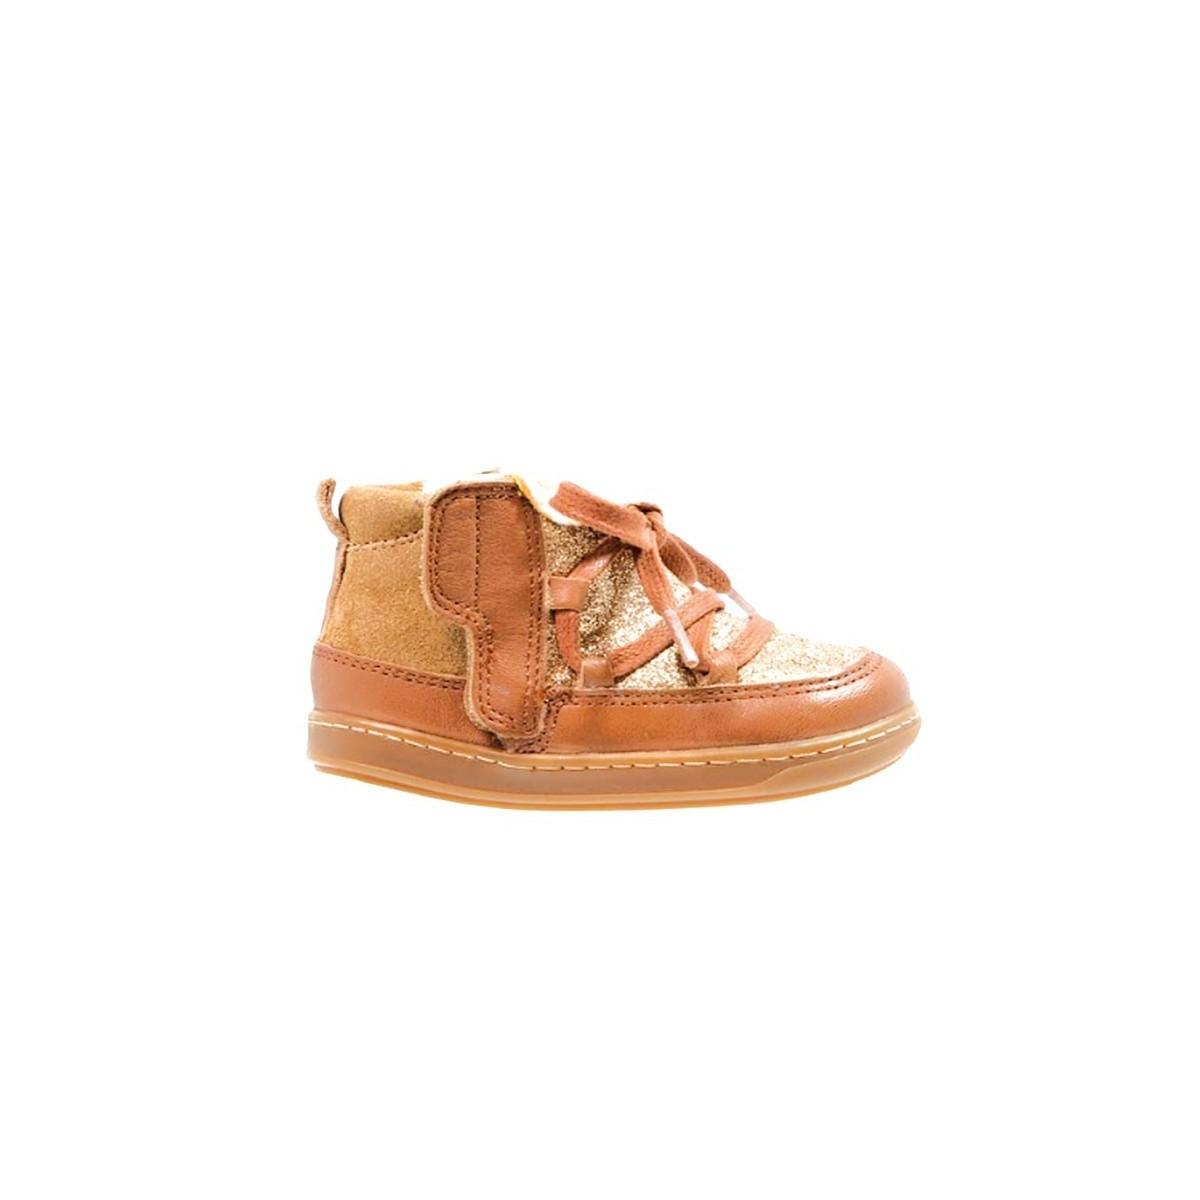 Boots Bouba glagla cognac/dore